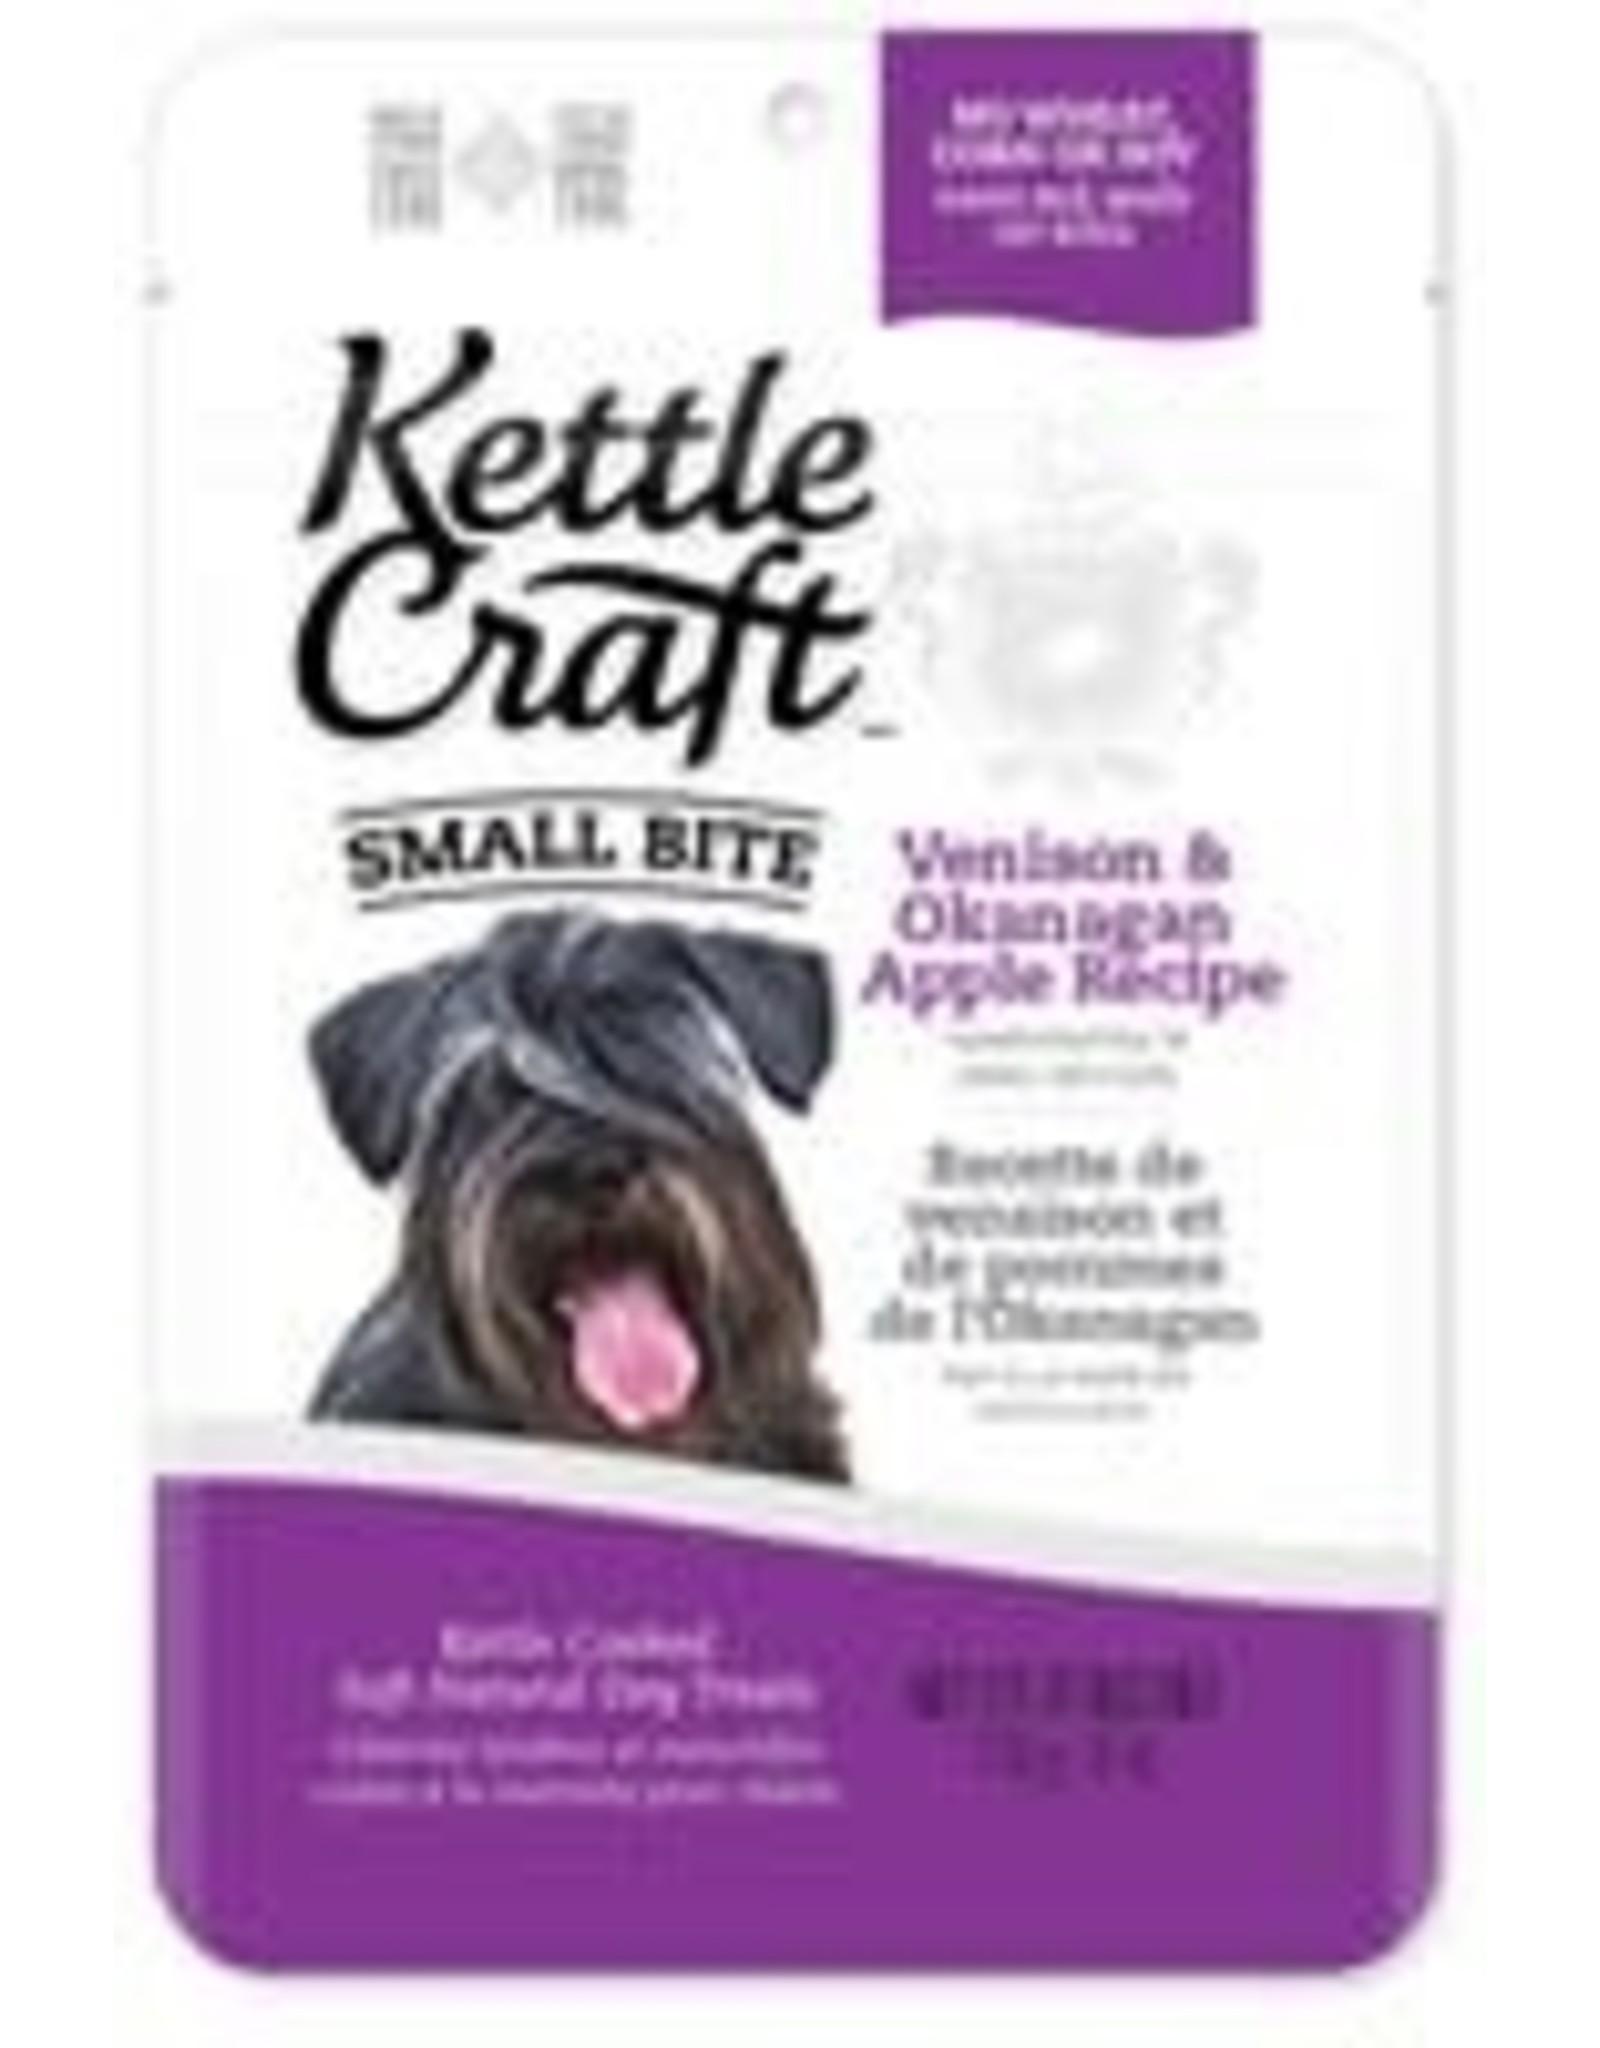 Kettle Craft K.C. Dog - Venison & Okanagan Apple - small bite 170g